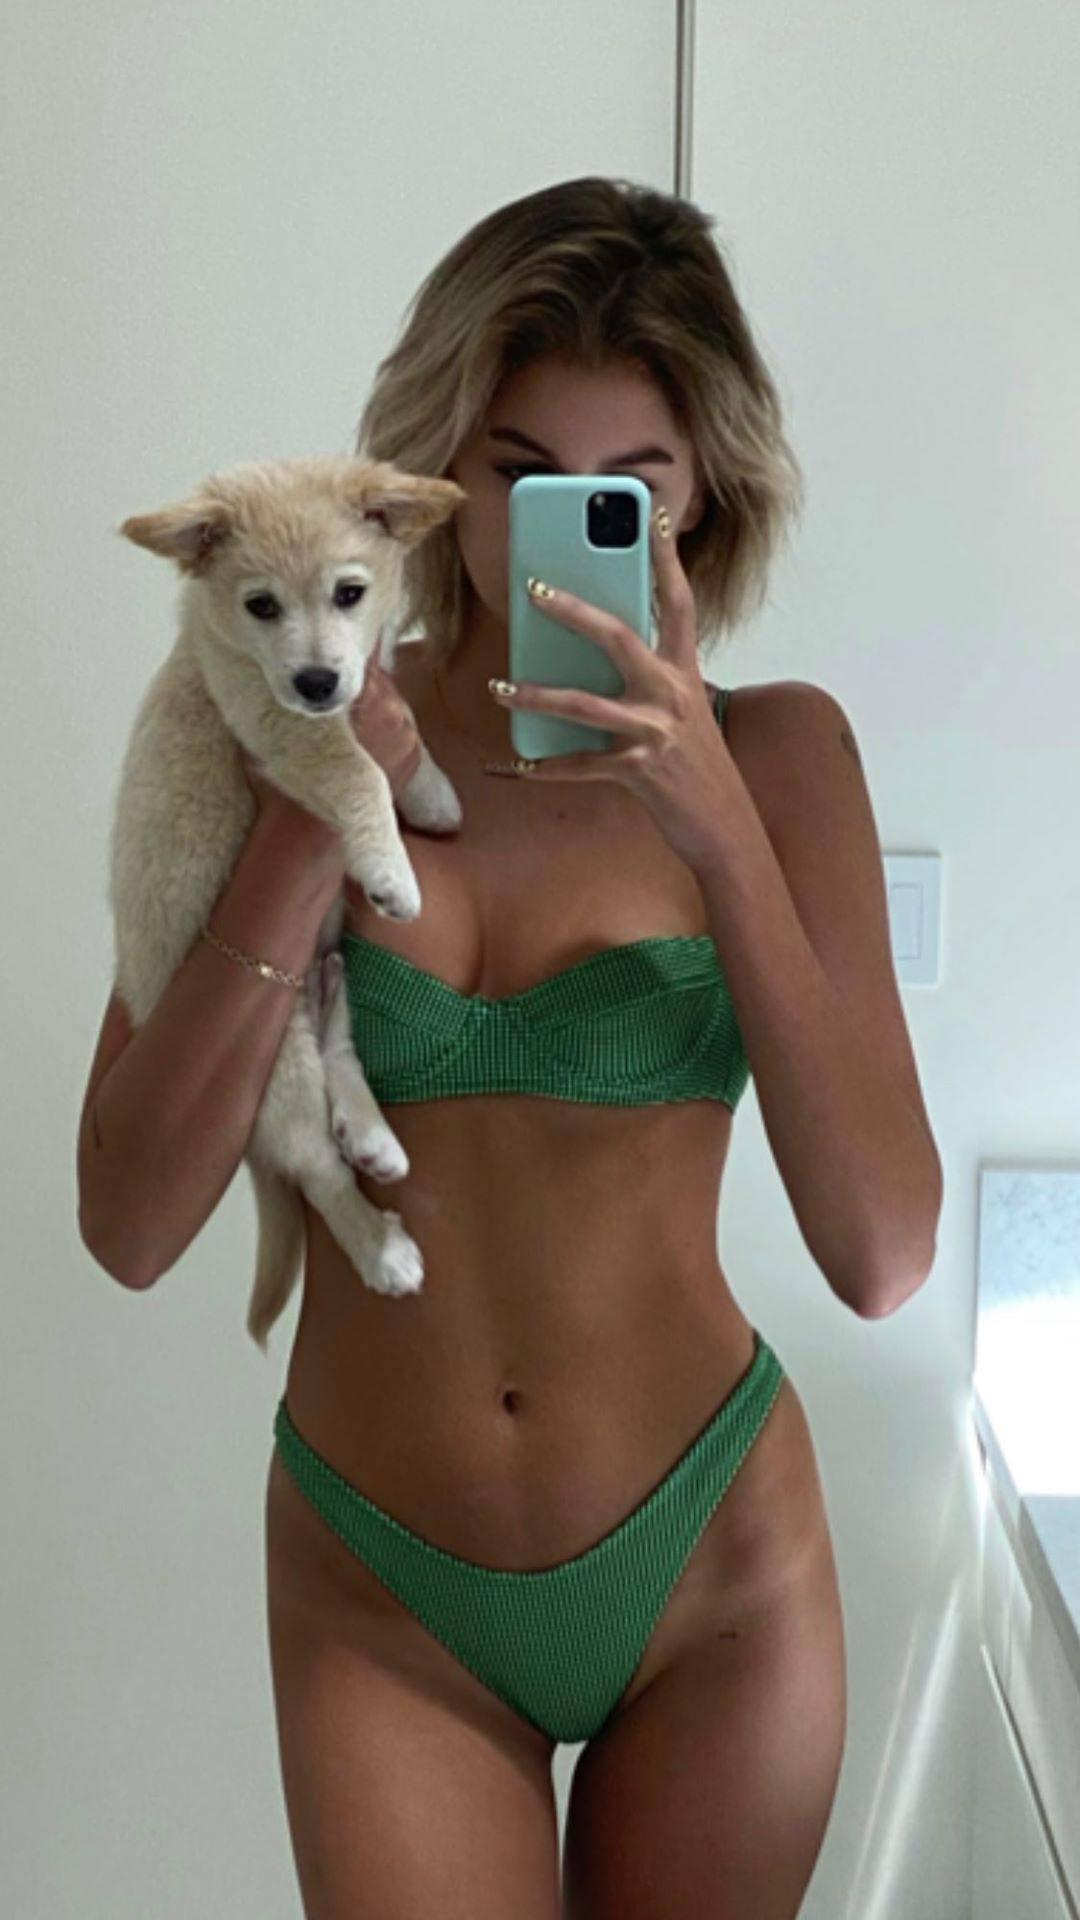 Kaia Gerber Selfie In Bikini